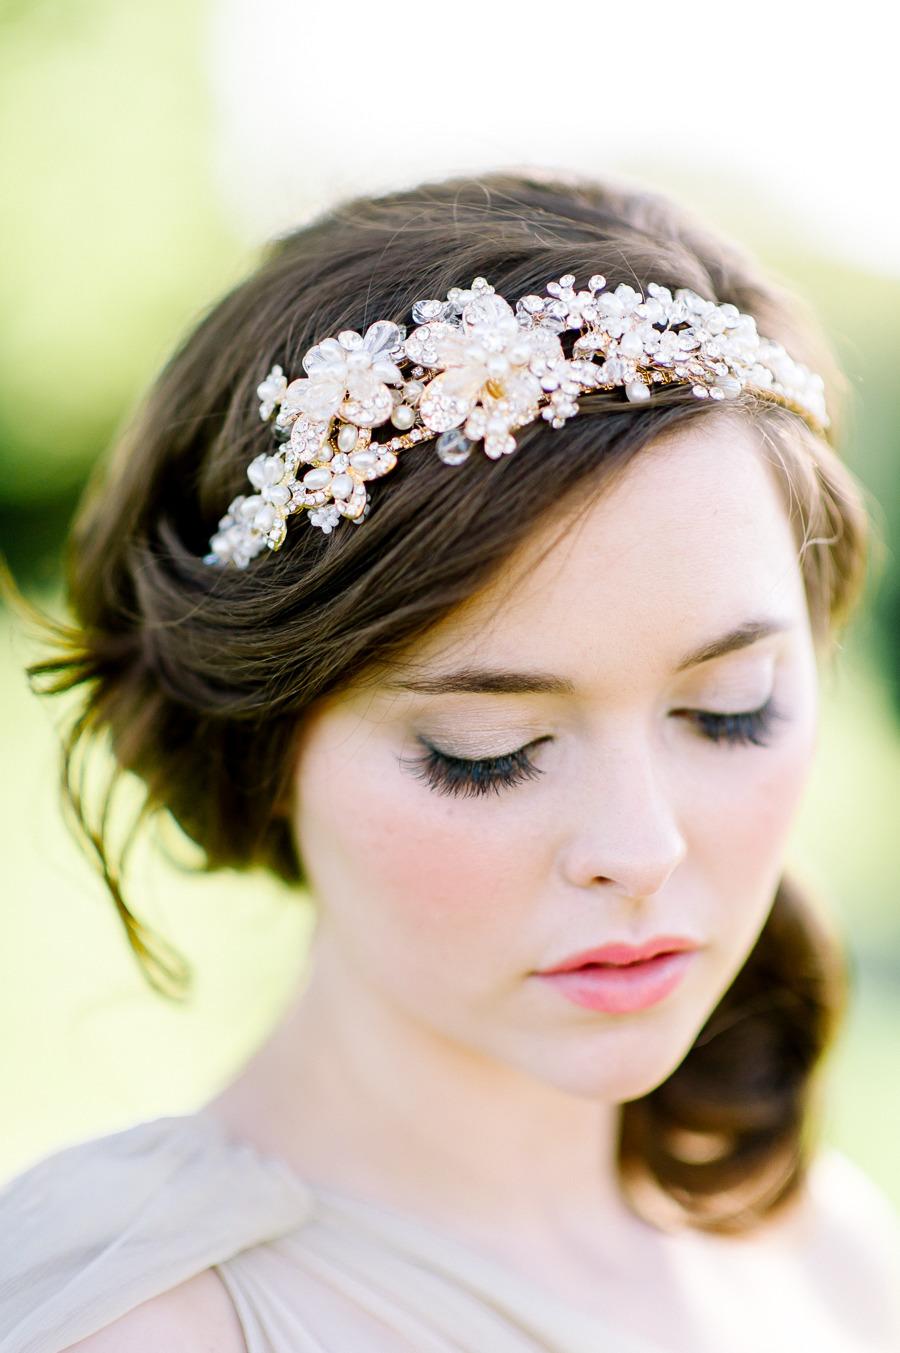 Romantic & Ethereal Wedding Inspiration Shoot | Photo Credit:  Julie LivingstonPhotography